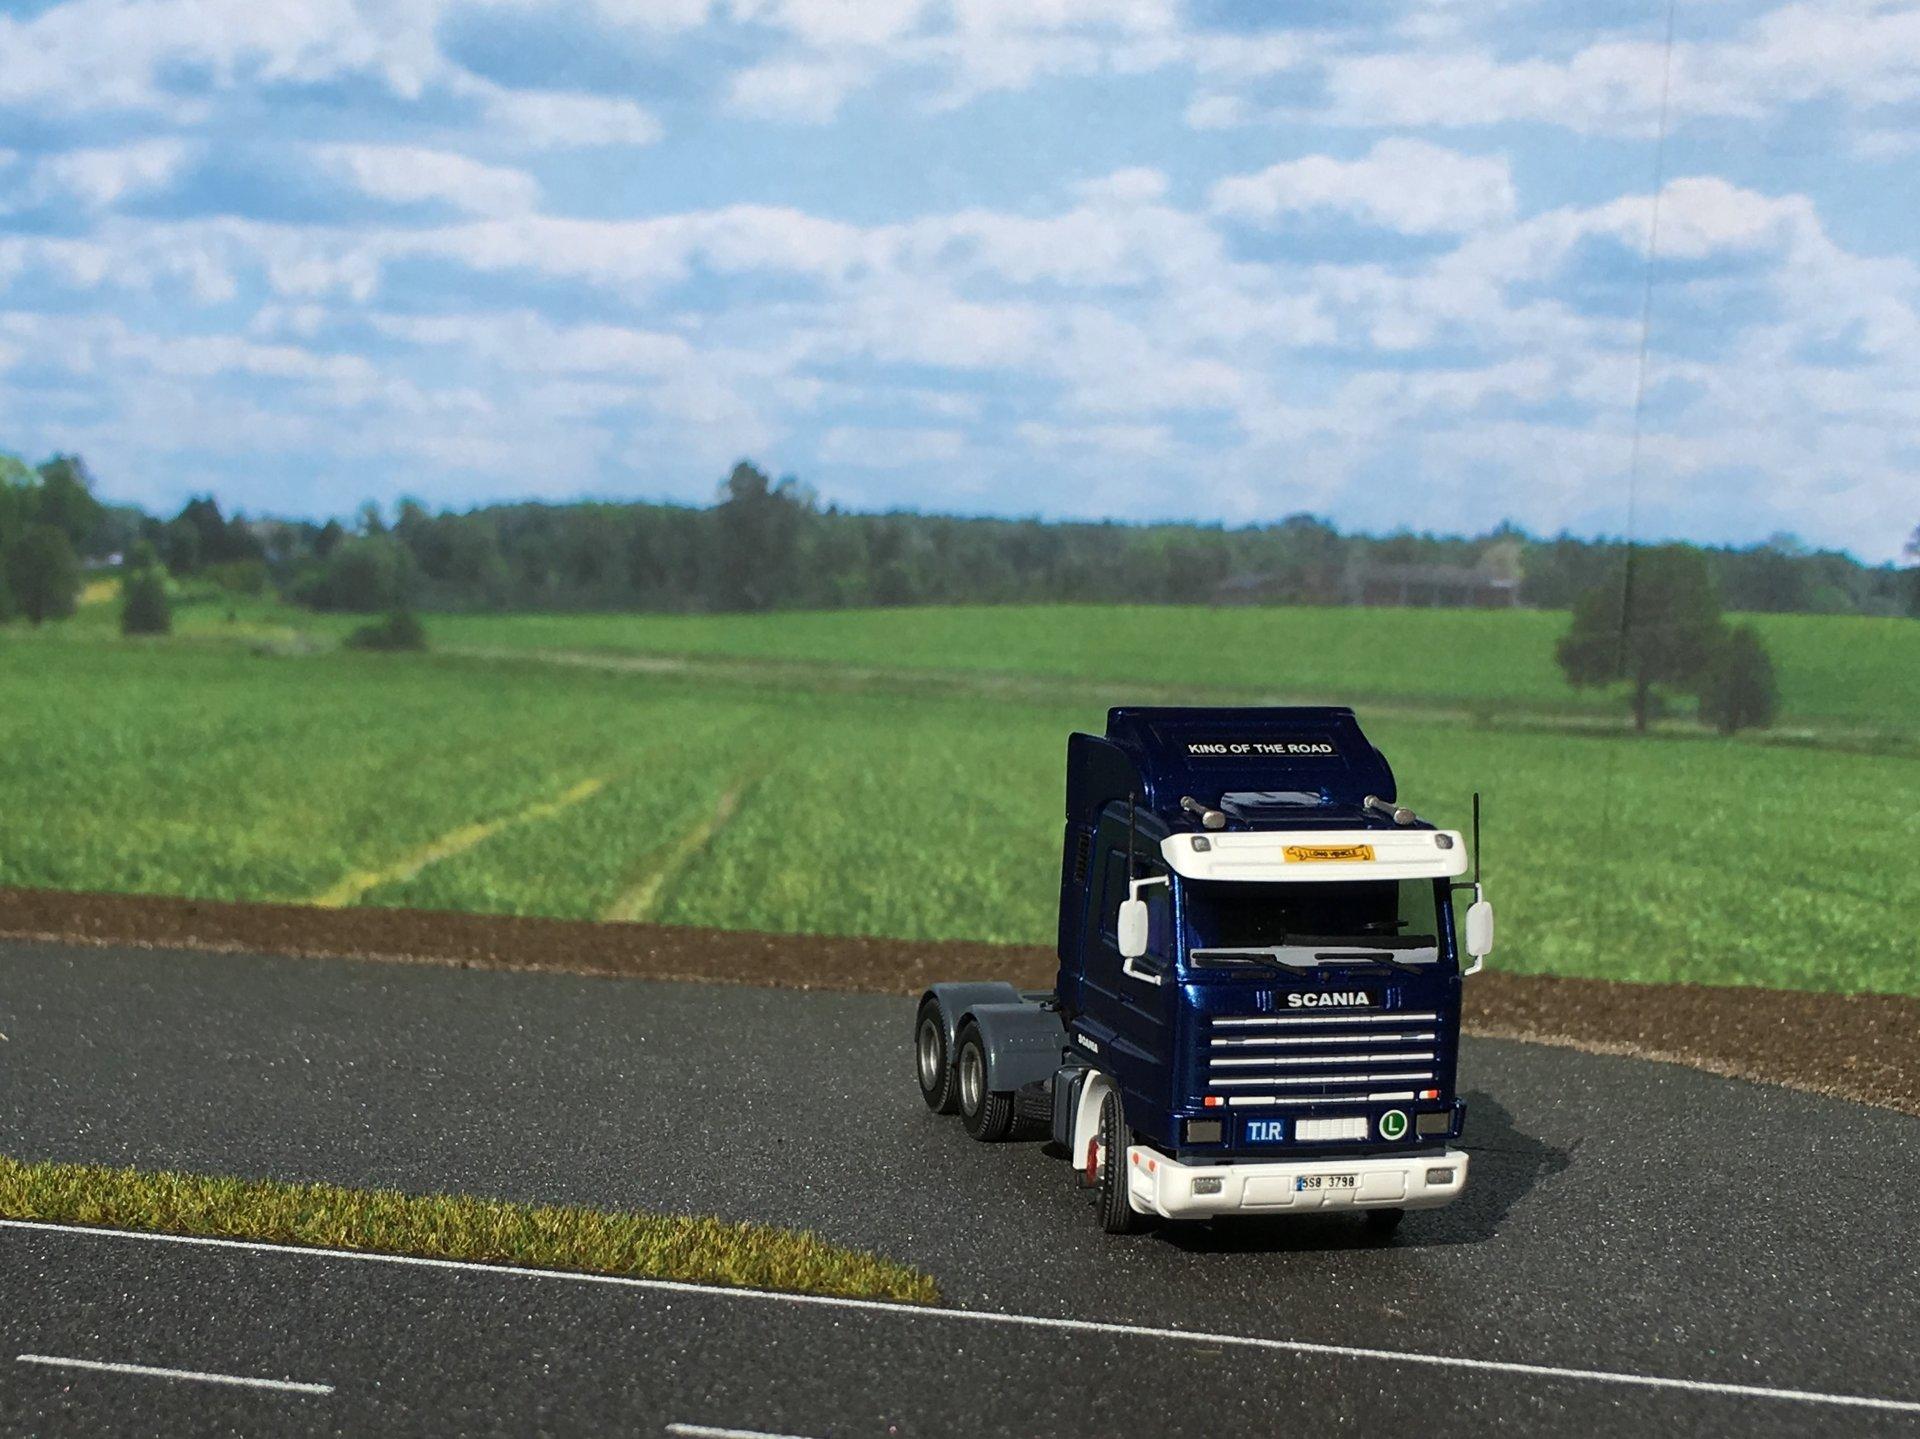 Scania AWM ciągnik 003.jpg